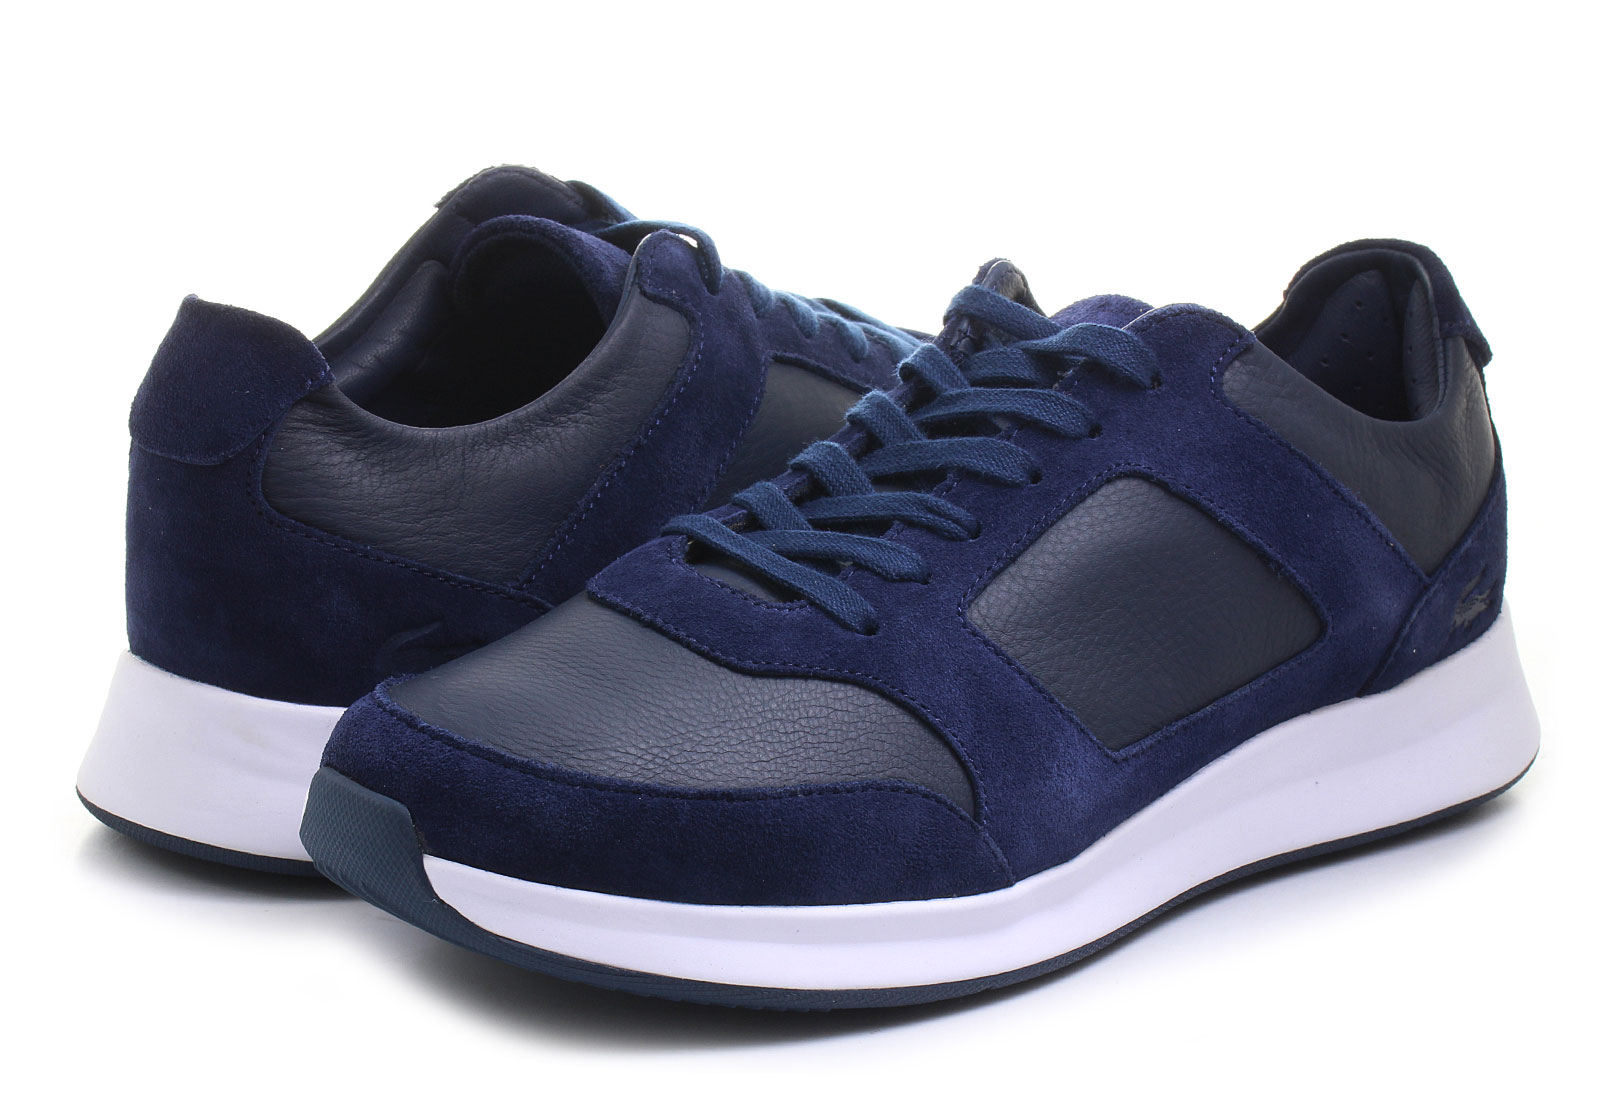 Lacoste Cipő - Joggeur - 161cam0116-003 - Office Shoes Magyarország 7cfe4446ea